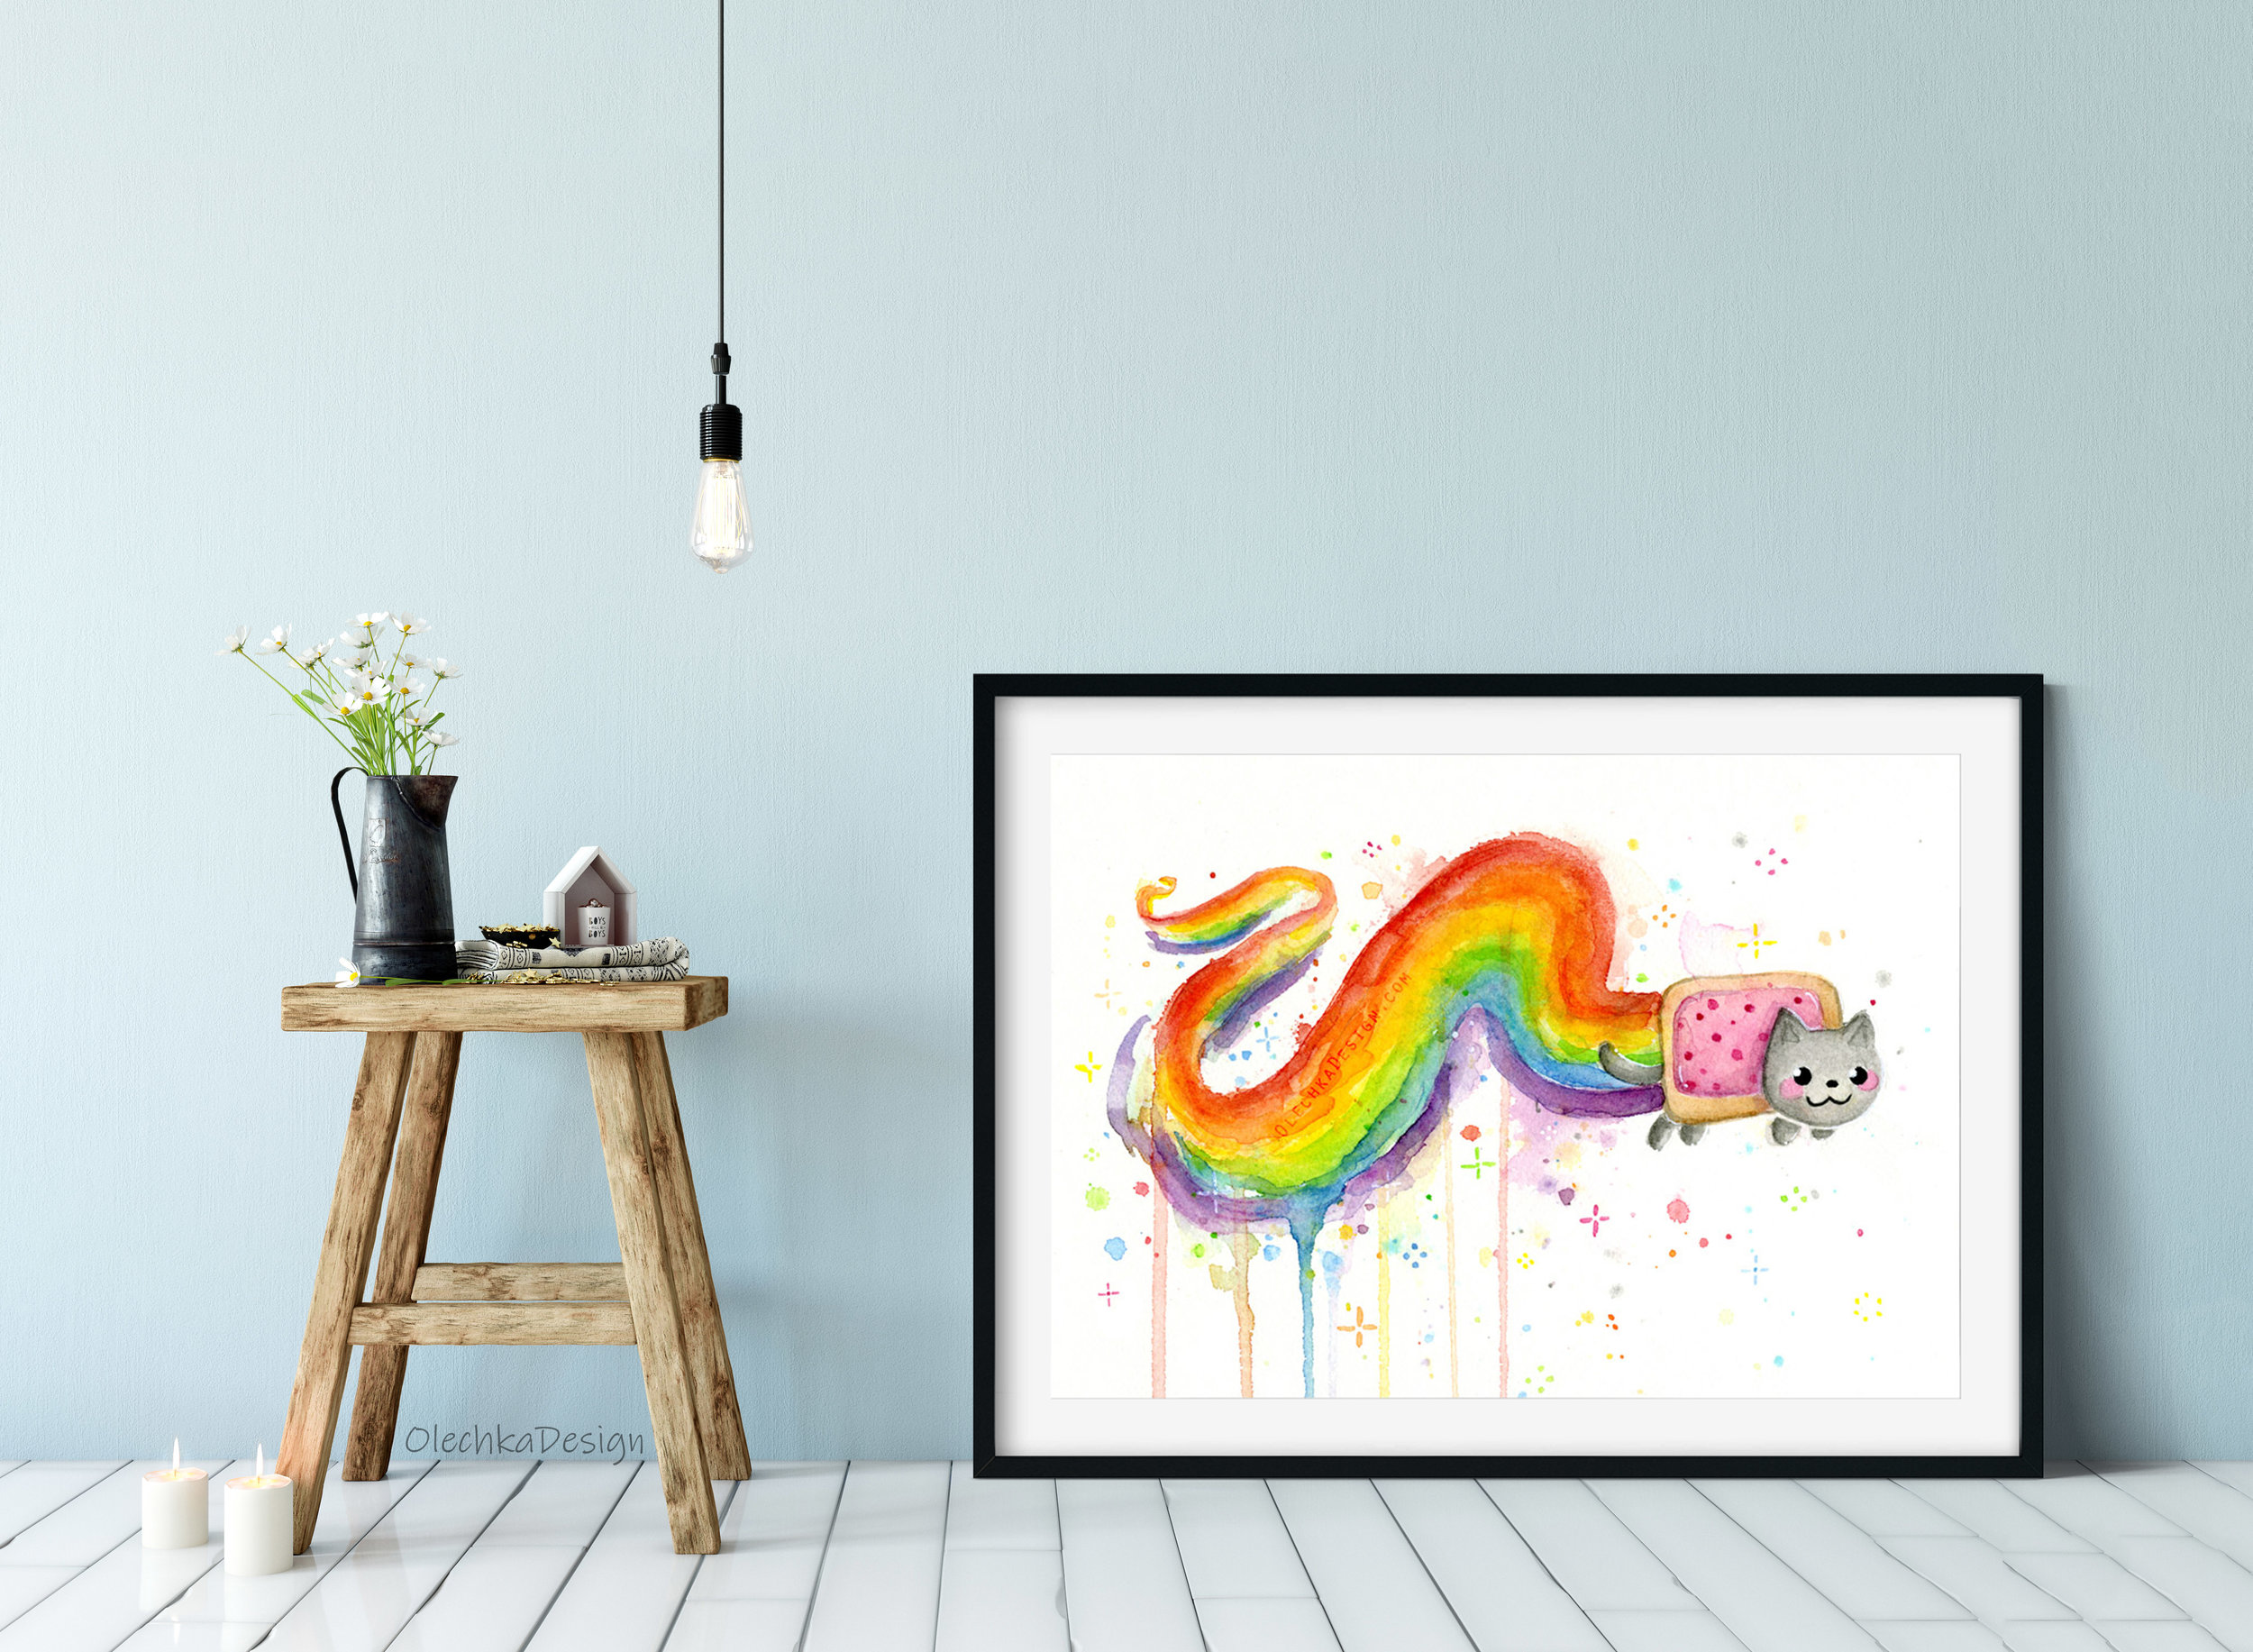 nyan-cat-watercolor-art.jpg